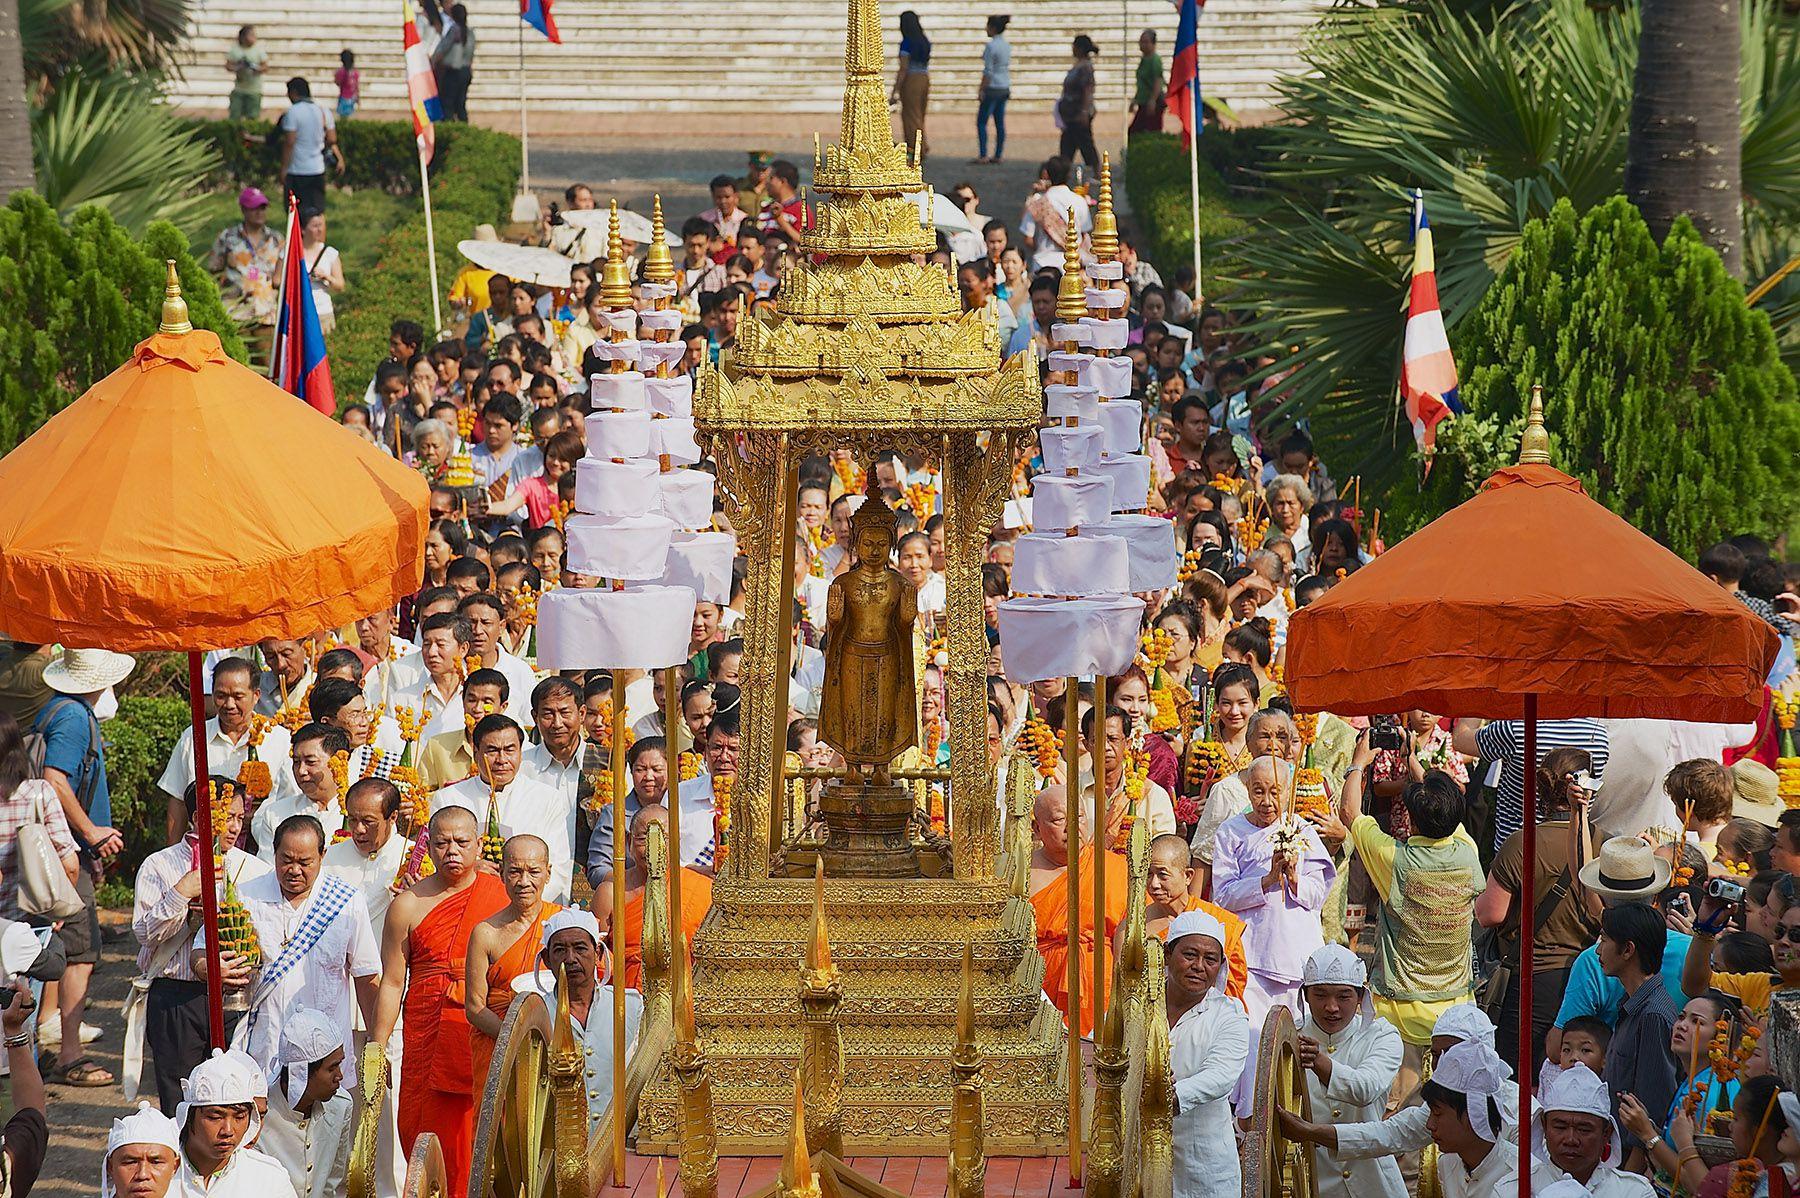 Pha Bang Procession, Bun Pi Mai, Luang Prabang